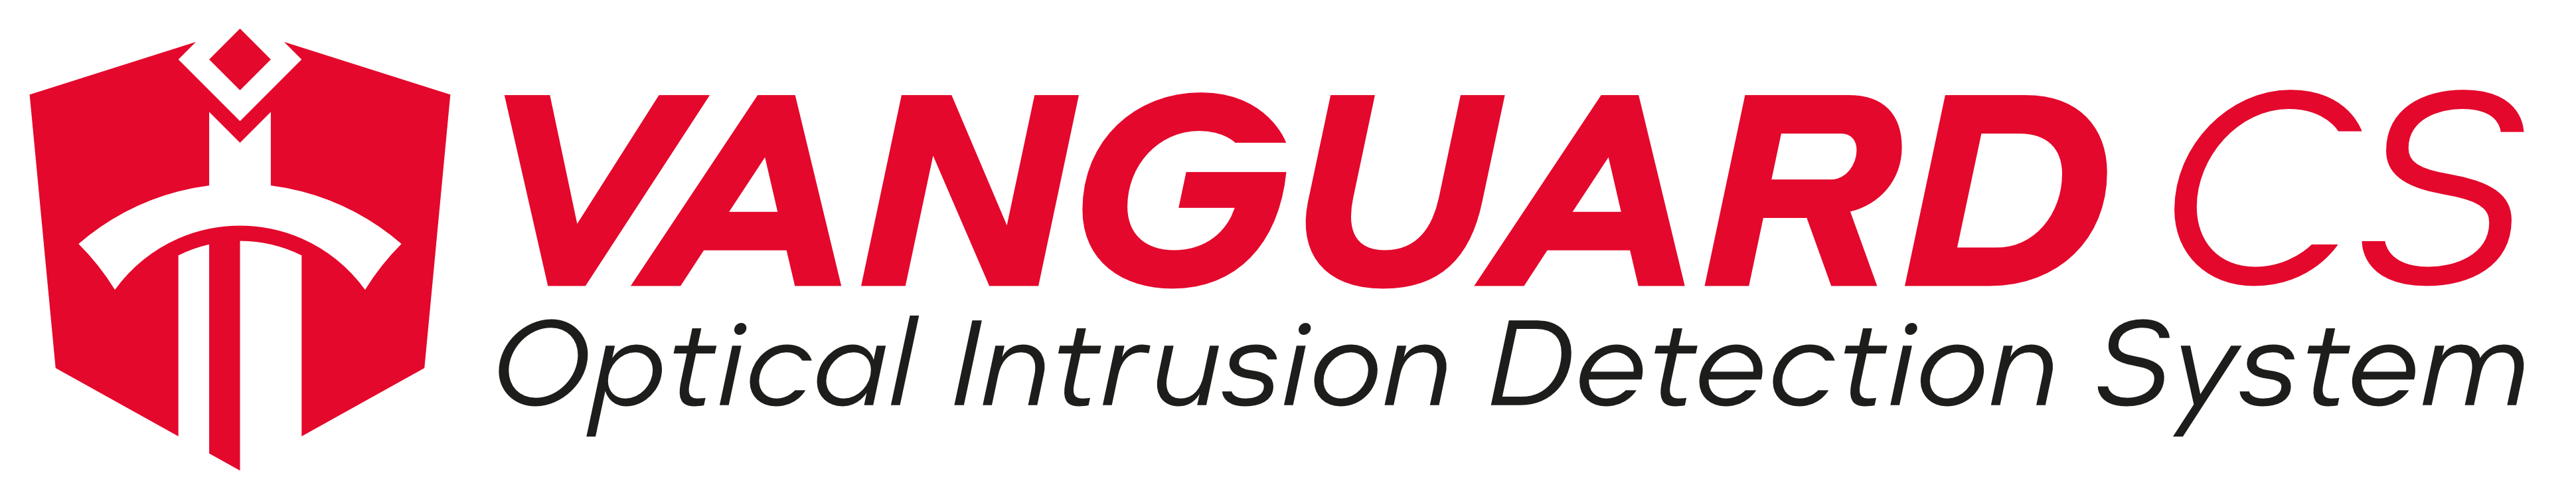 Vanguard CS - Full Logo